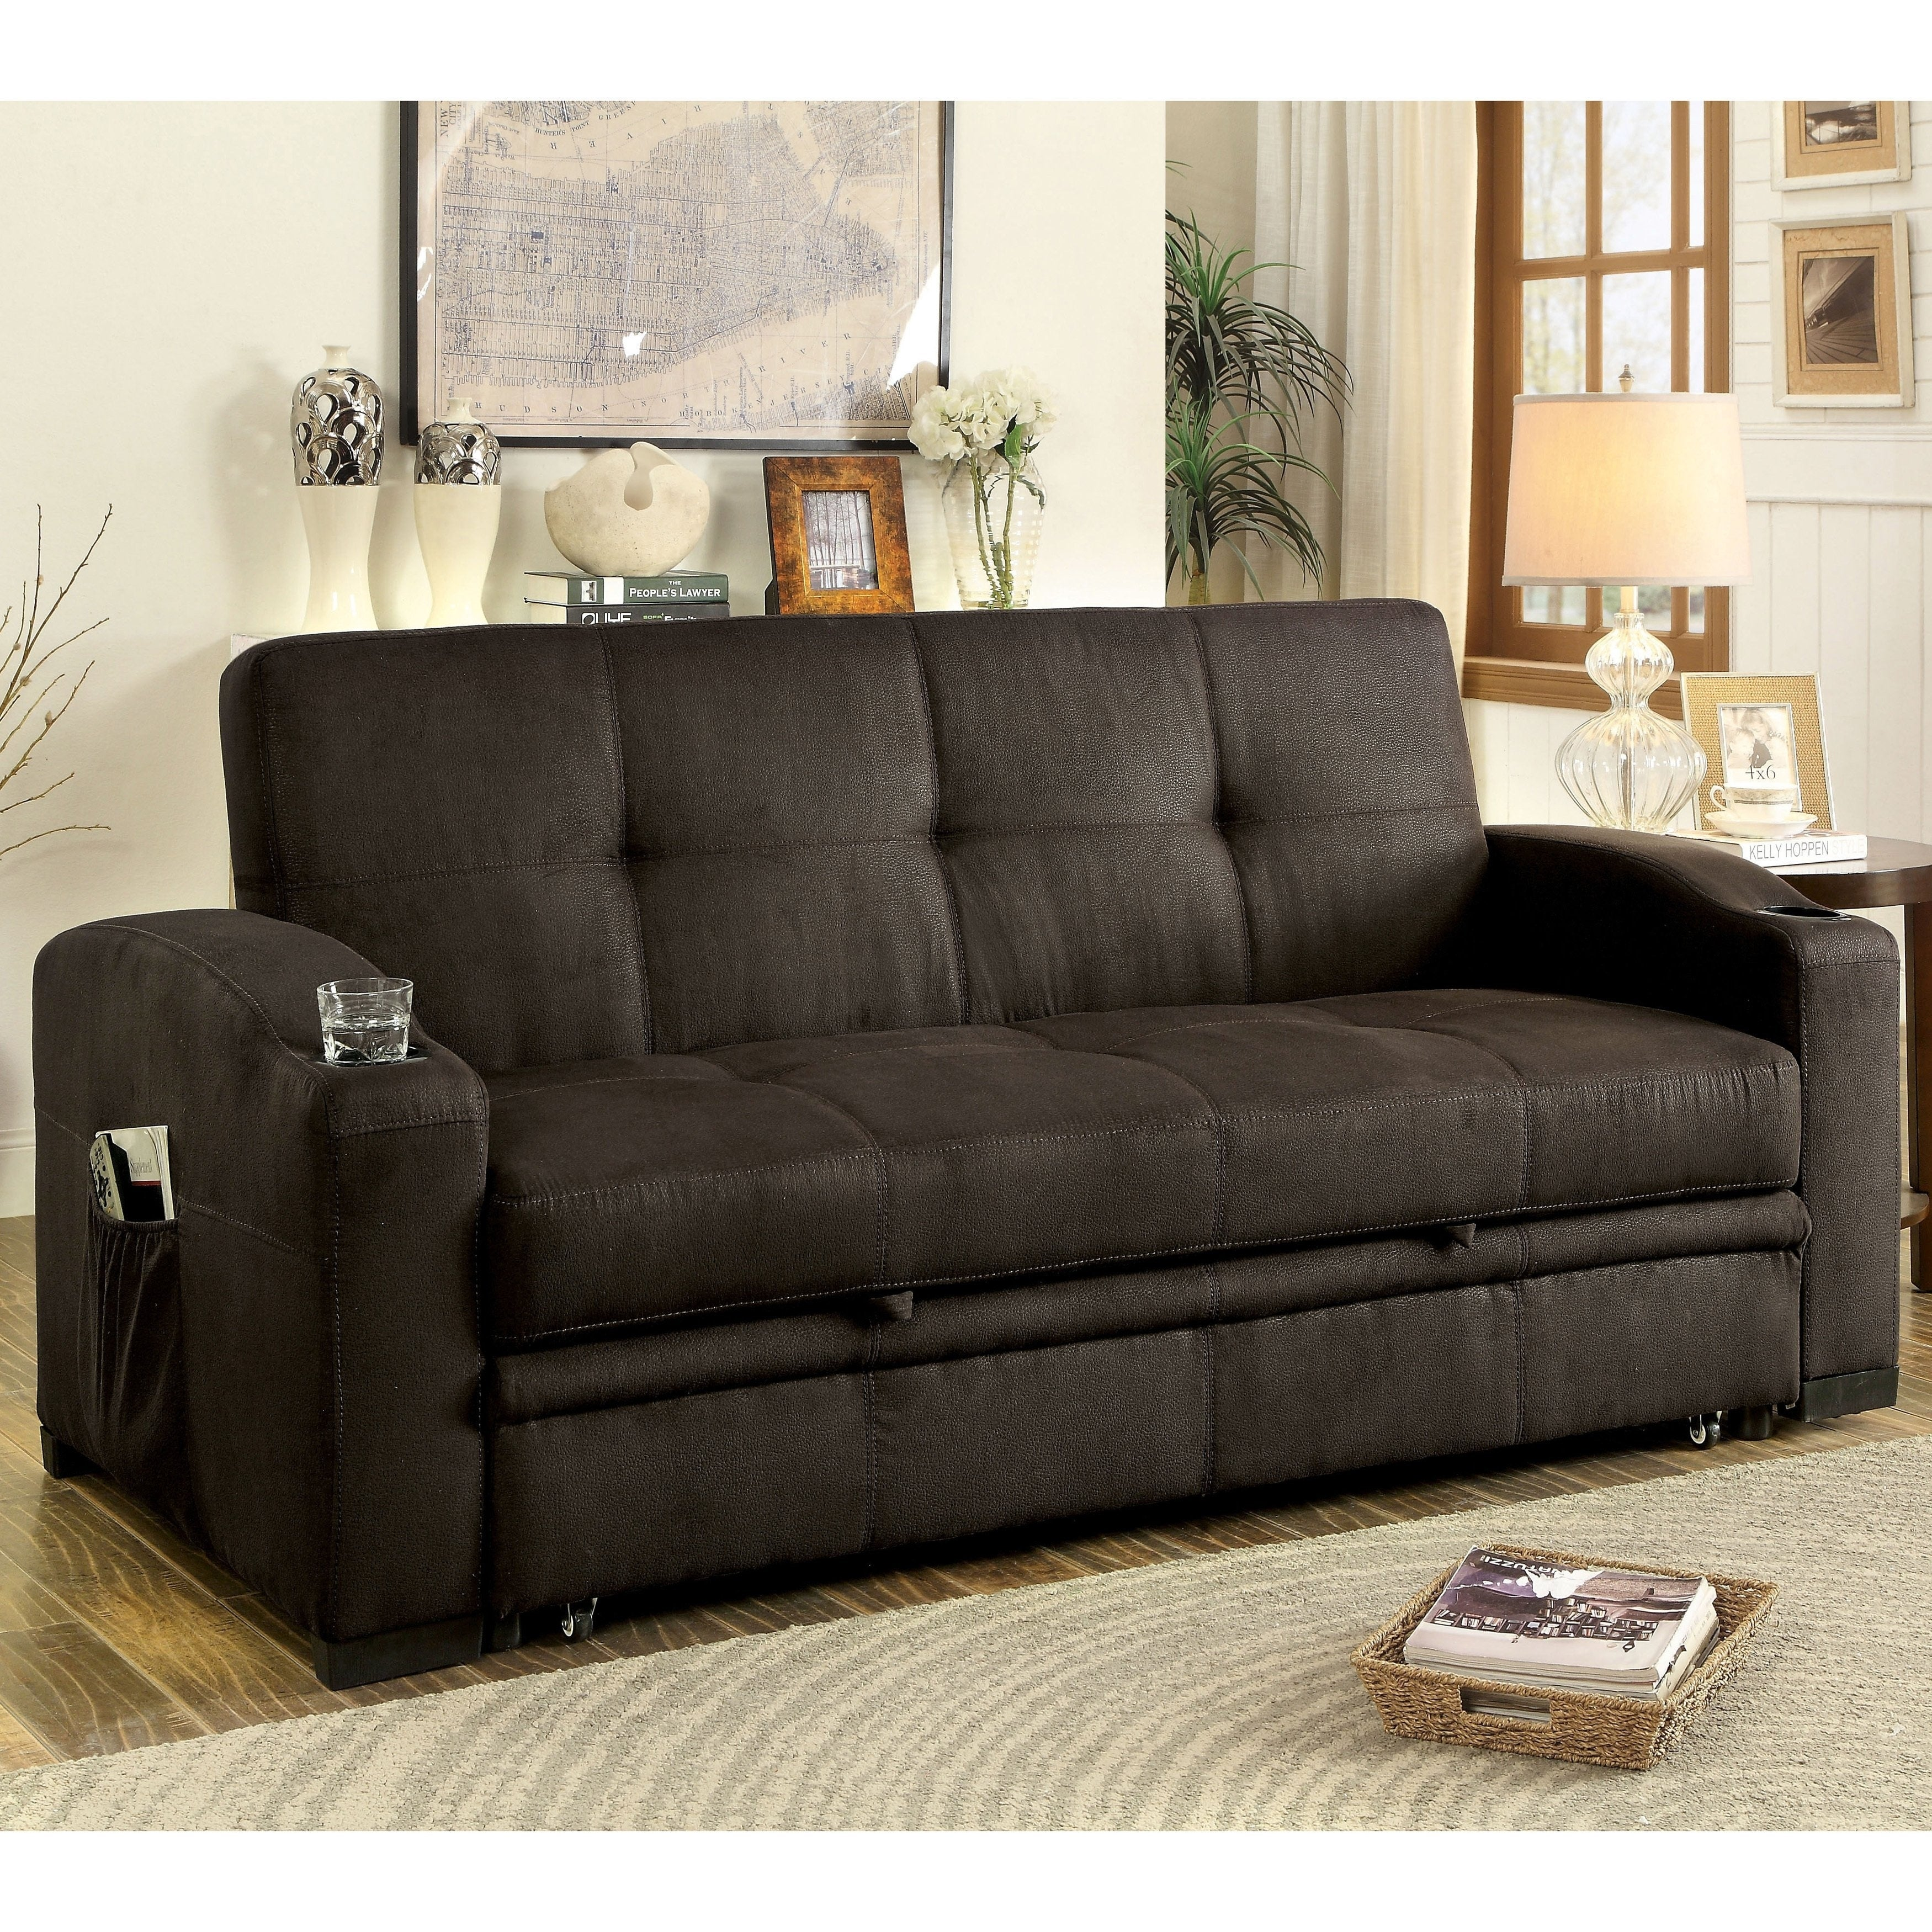 Furniture of America Melani Contemporary Tufted Multi-fun...